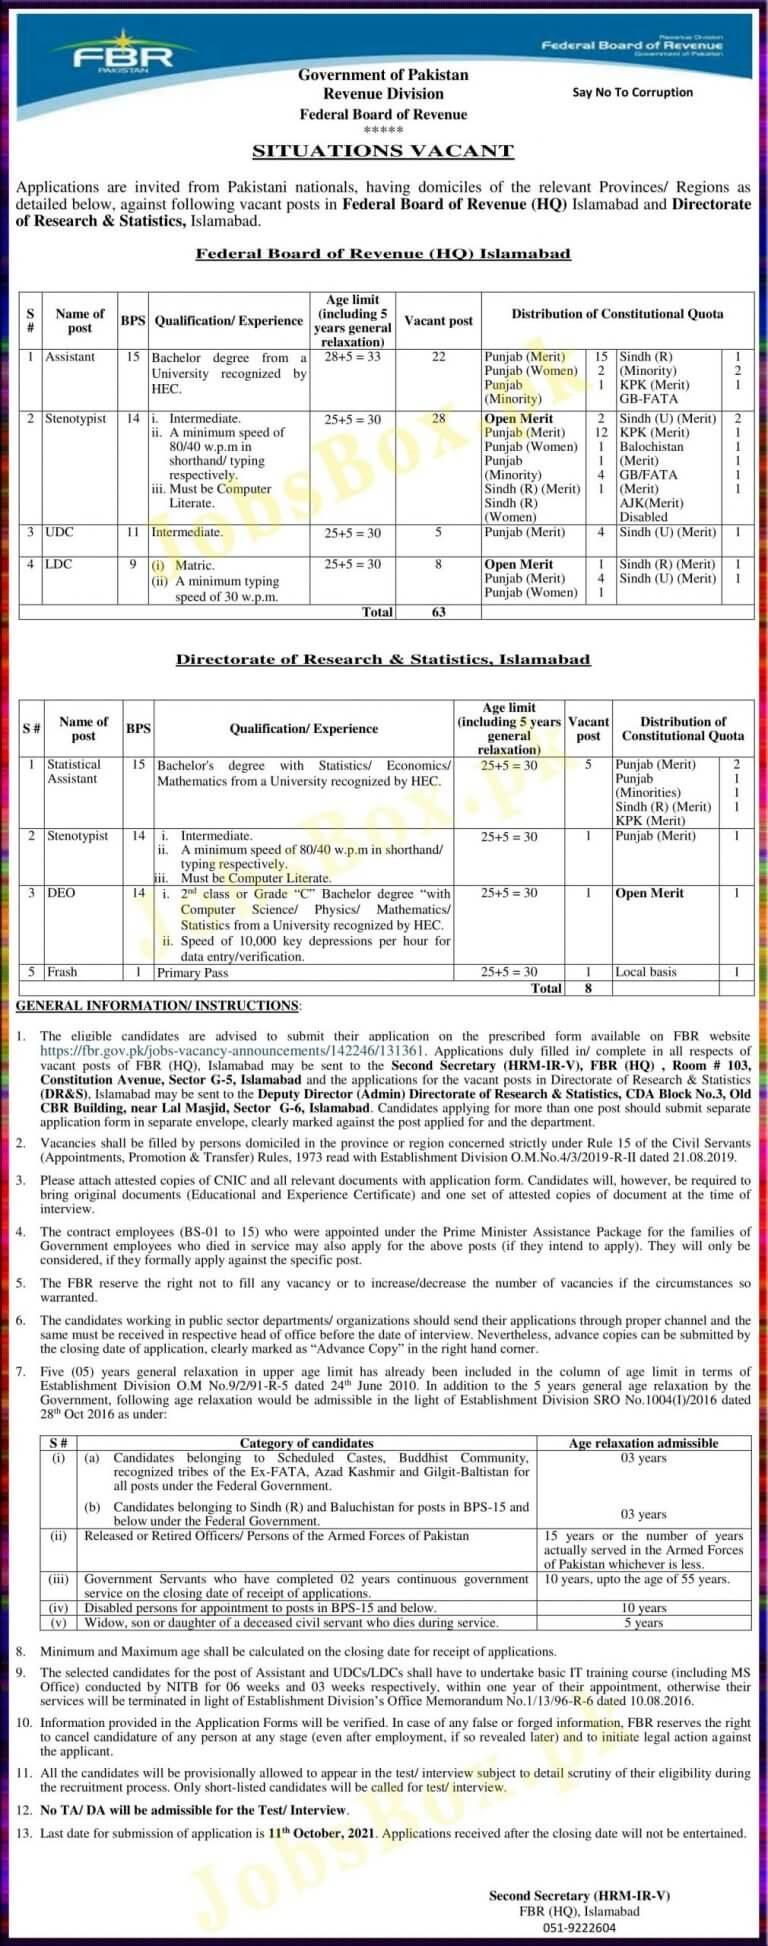 FBR Jobs 2021 - FBR Federal Board of Revenue Jobs 2021 in Pakistan